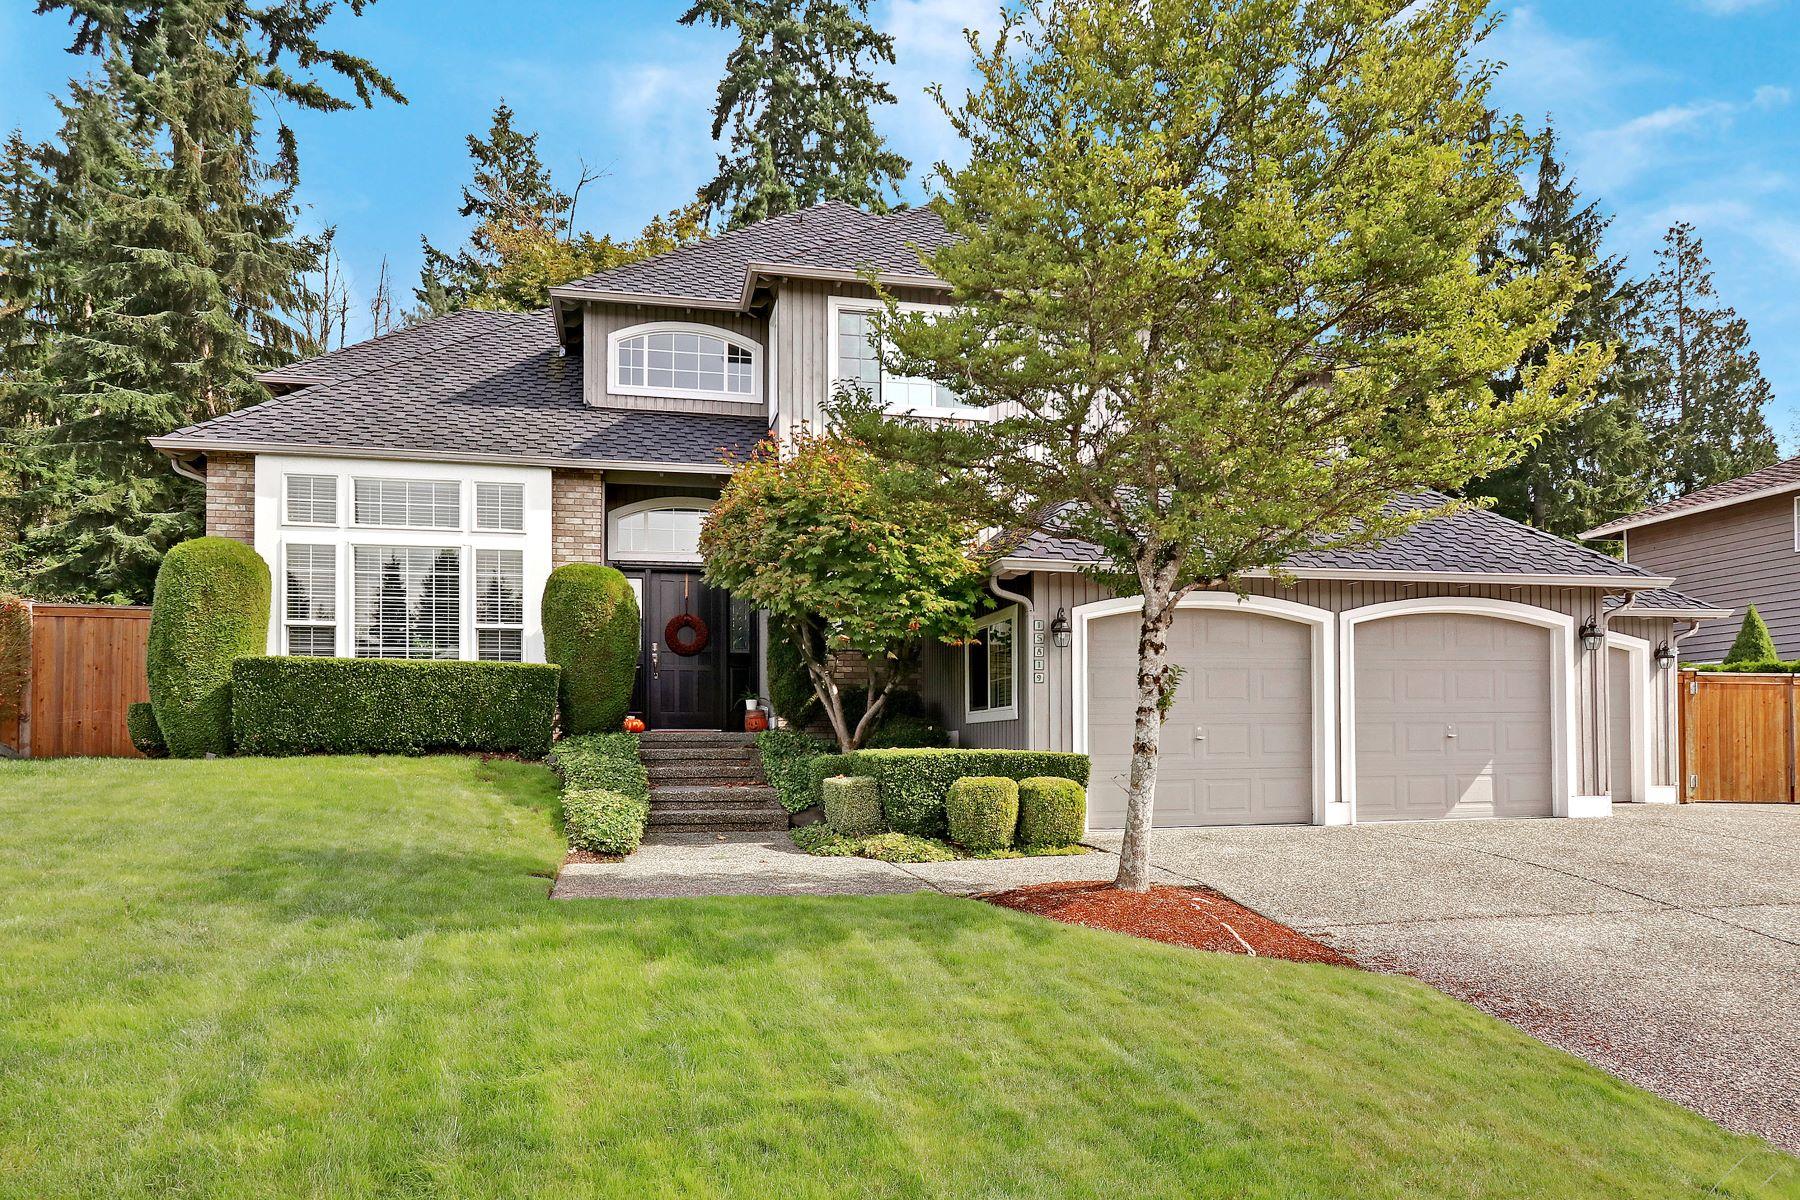 Single Family Homes por un Venta en 15819 68th Ave SE, Snohomish, WA 98296 15819 68th Ave SE Snohomish, Washington 98296 Estados Unidos